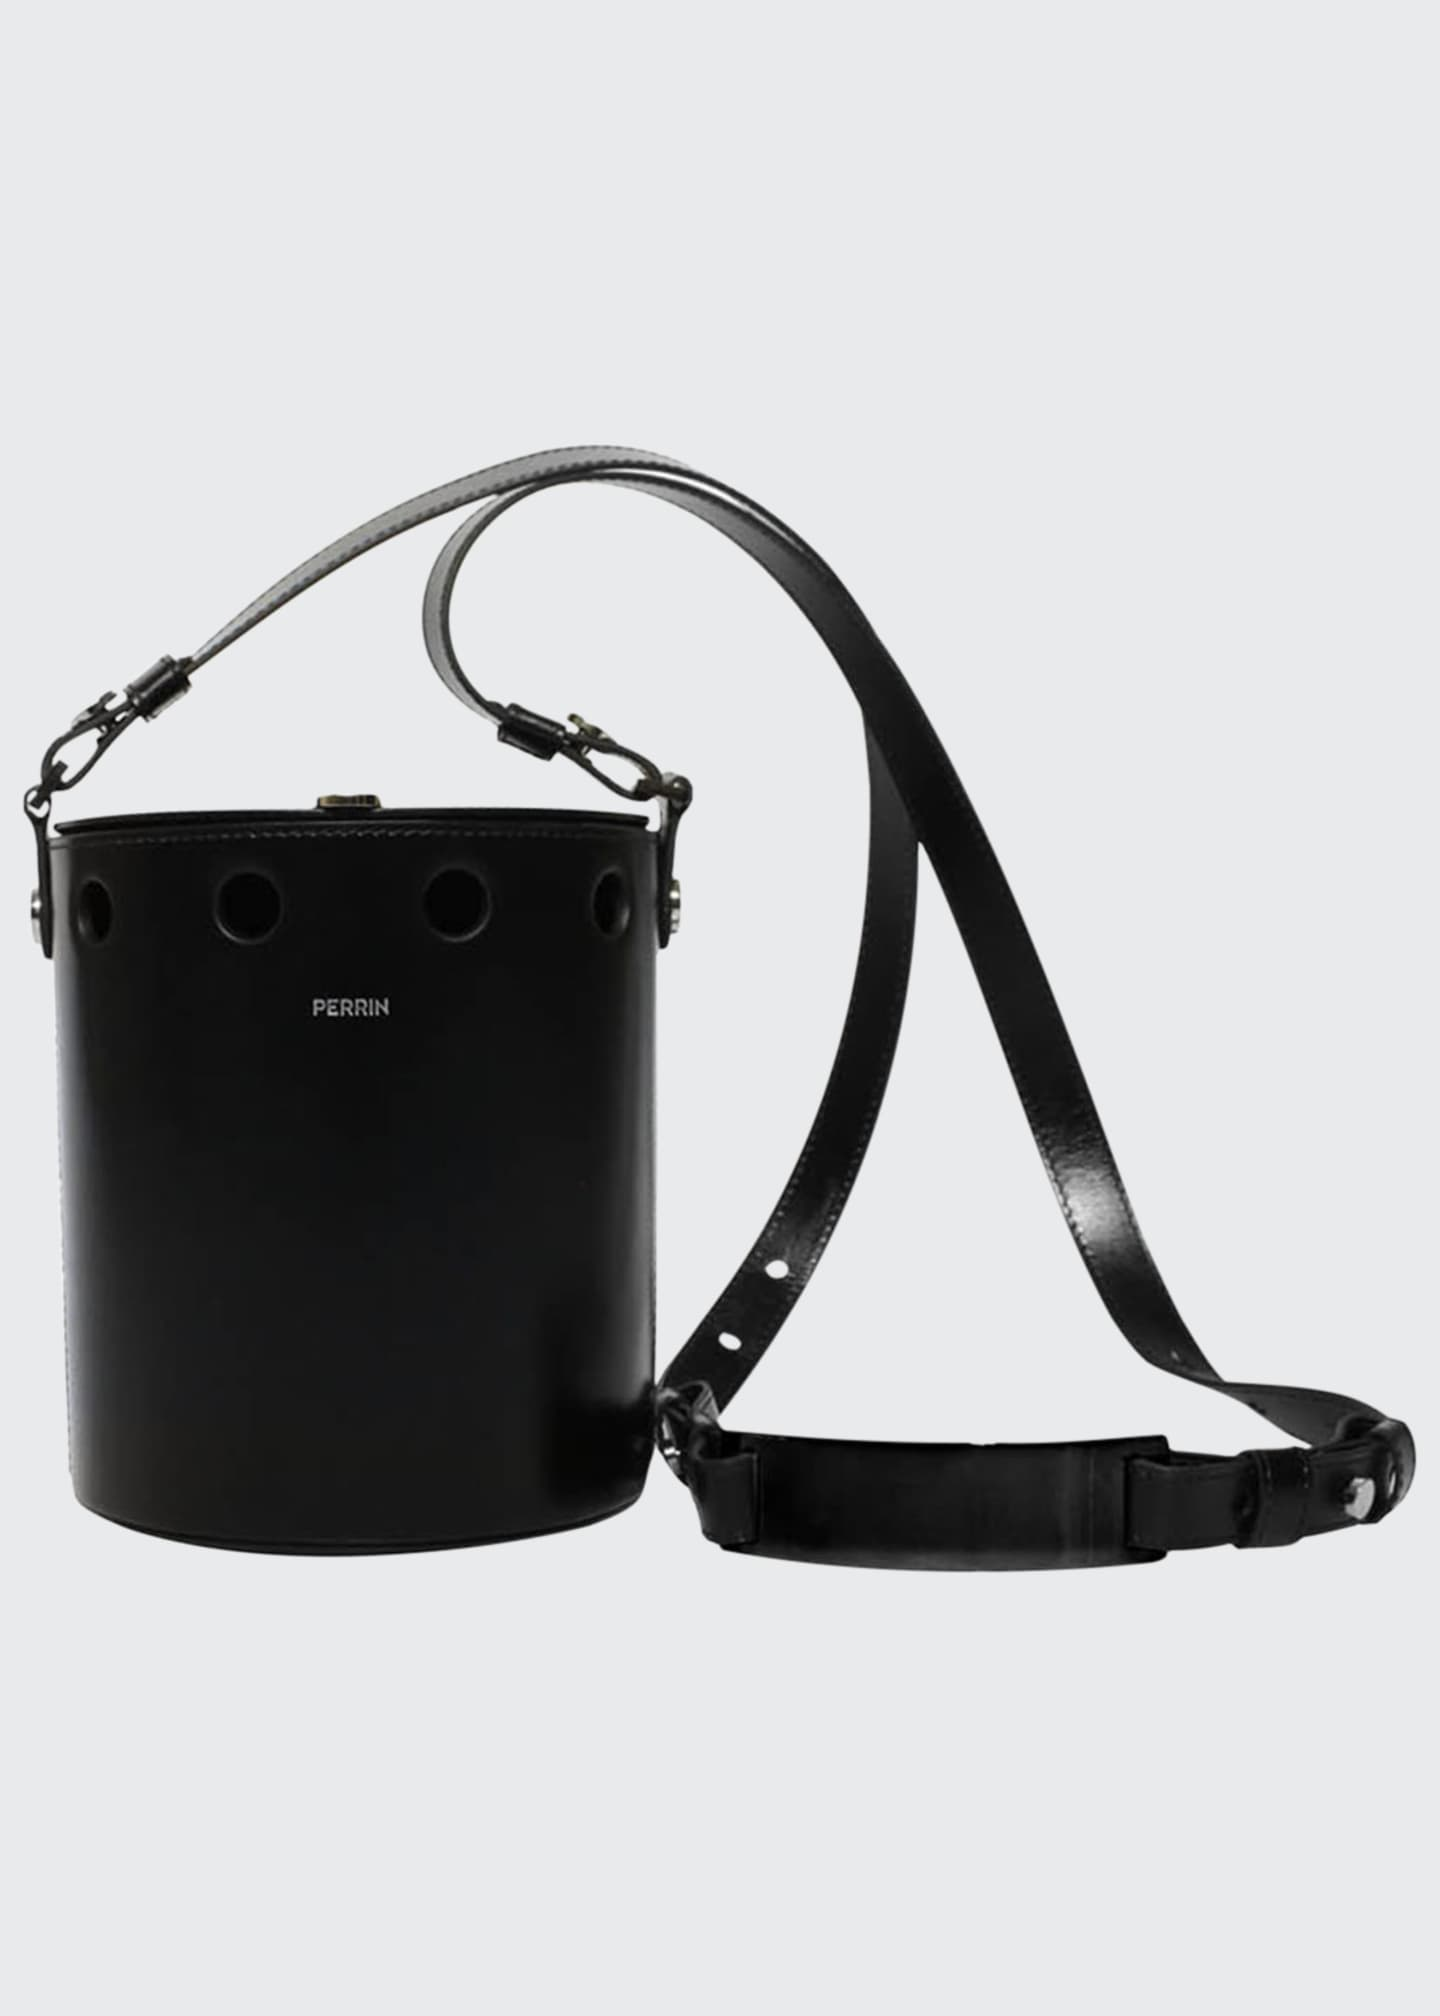 Perrin Paris Demi Seau Studded Bucket Bag